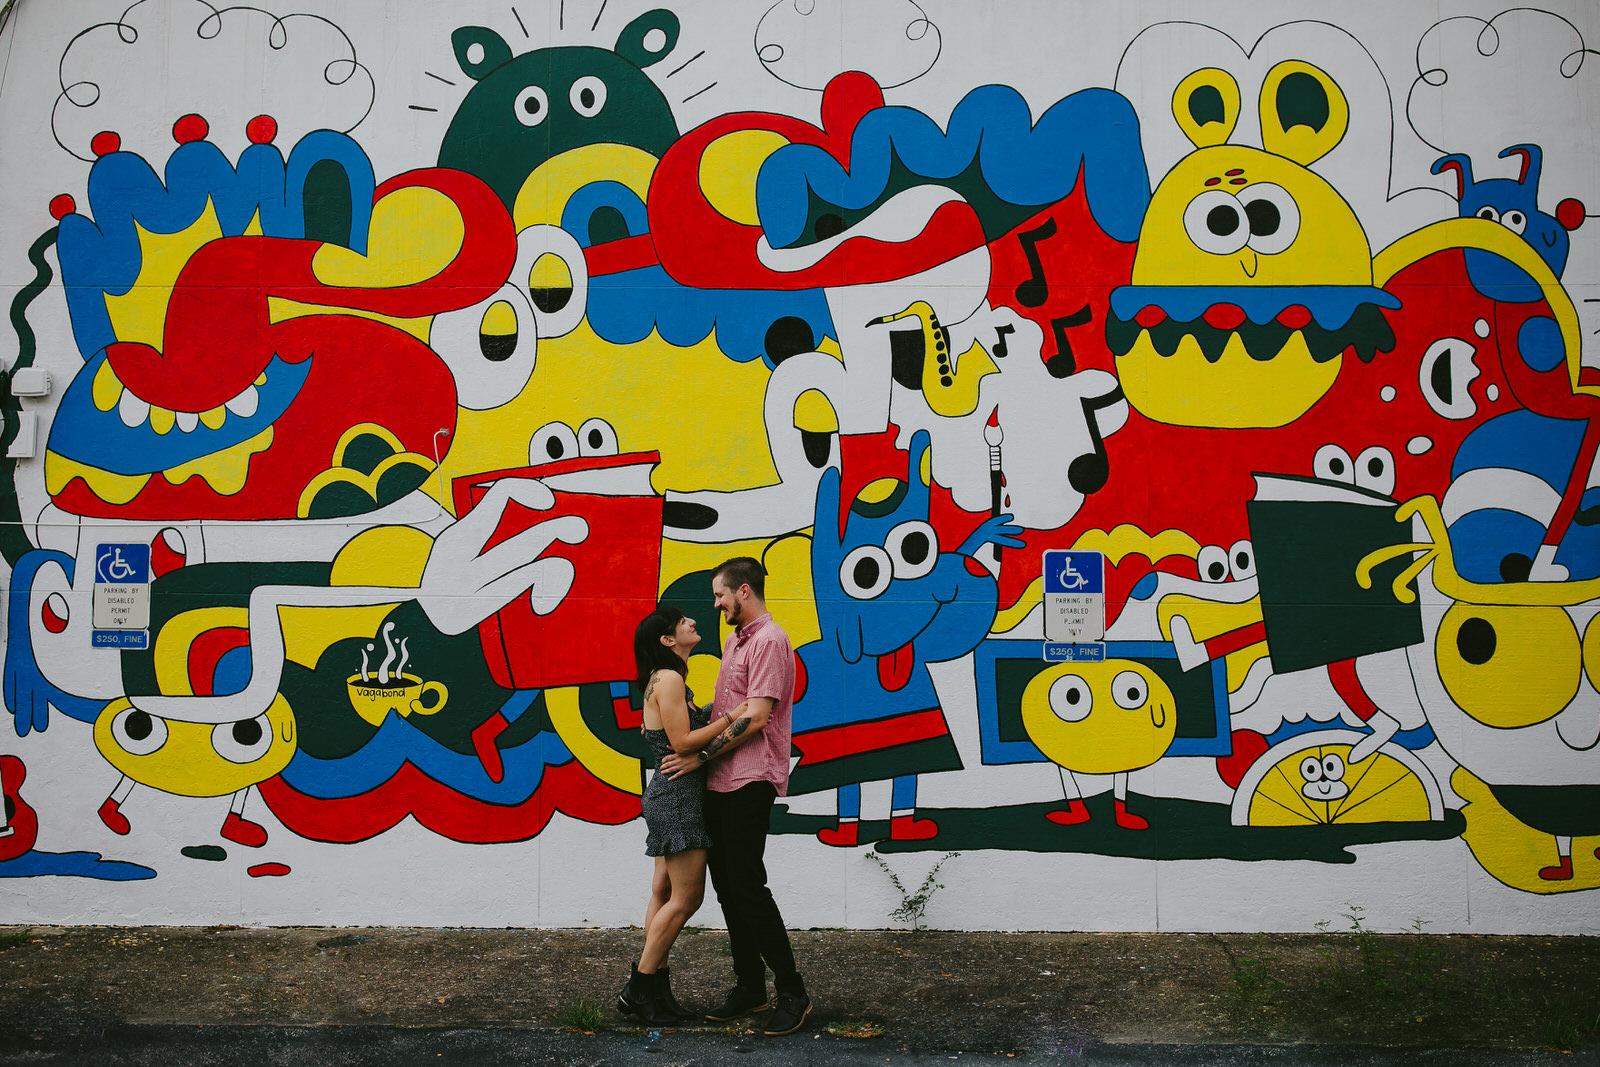 fun-urban-couples-portraits-graffiti-art-tattoos-tiny-house-photo-murray-hill-portrait-photographer.jpg